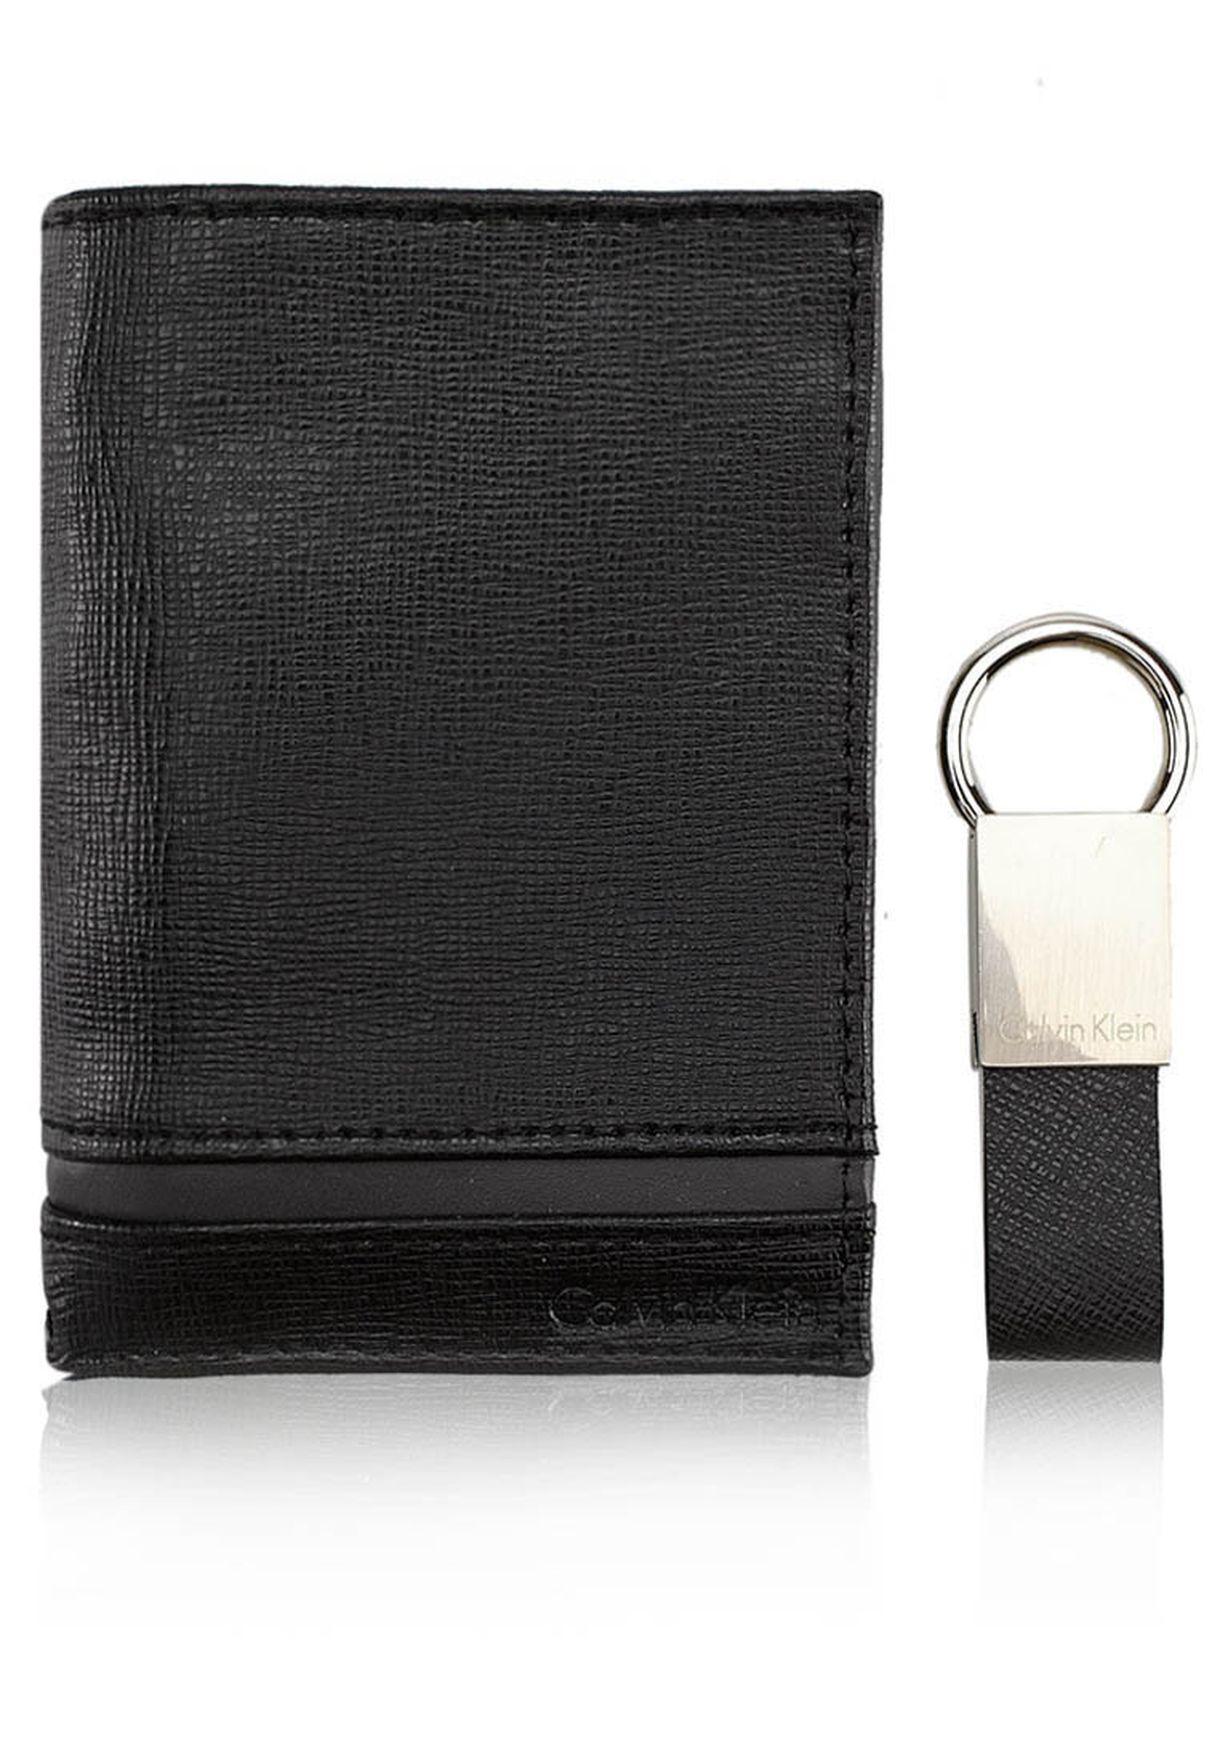 a32e4078cf4fb تسوق حامل بطاقات ماركة كالفن كلاين لون أسود في السعودية - CA787AC50SVH